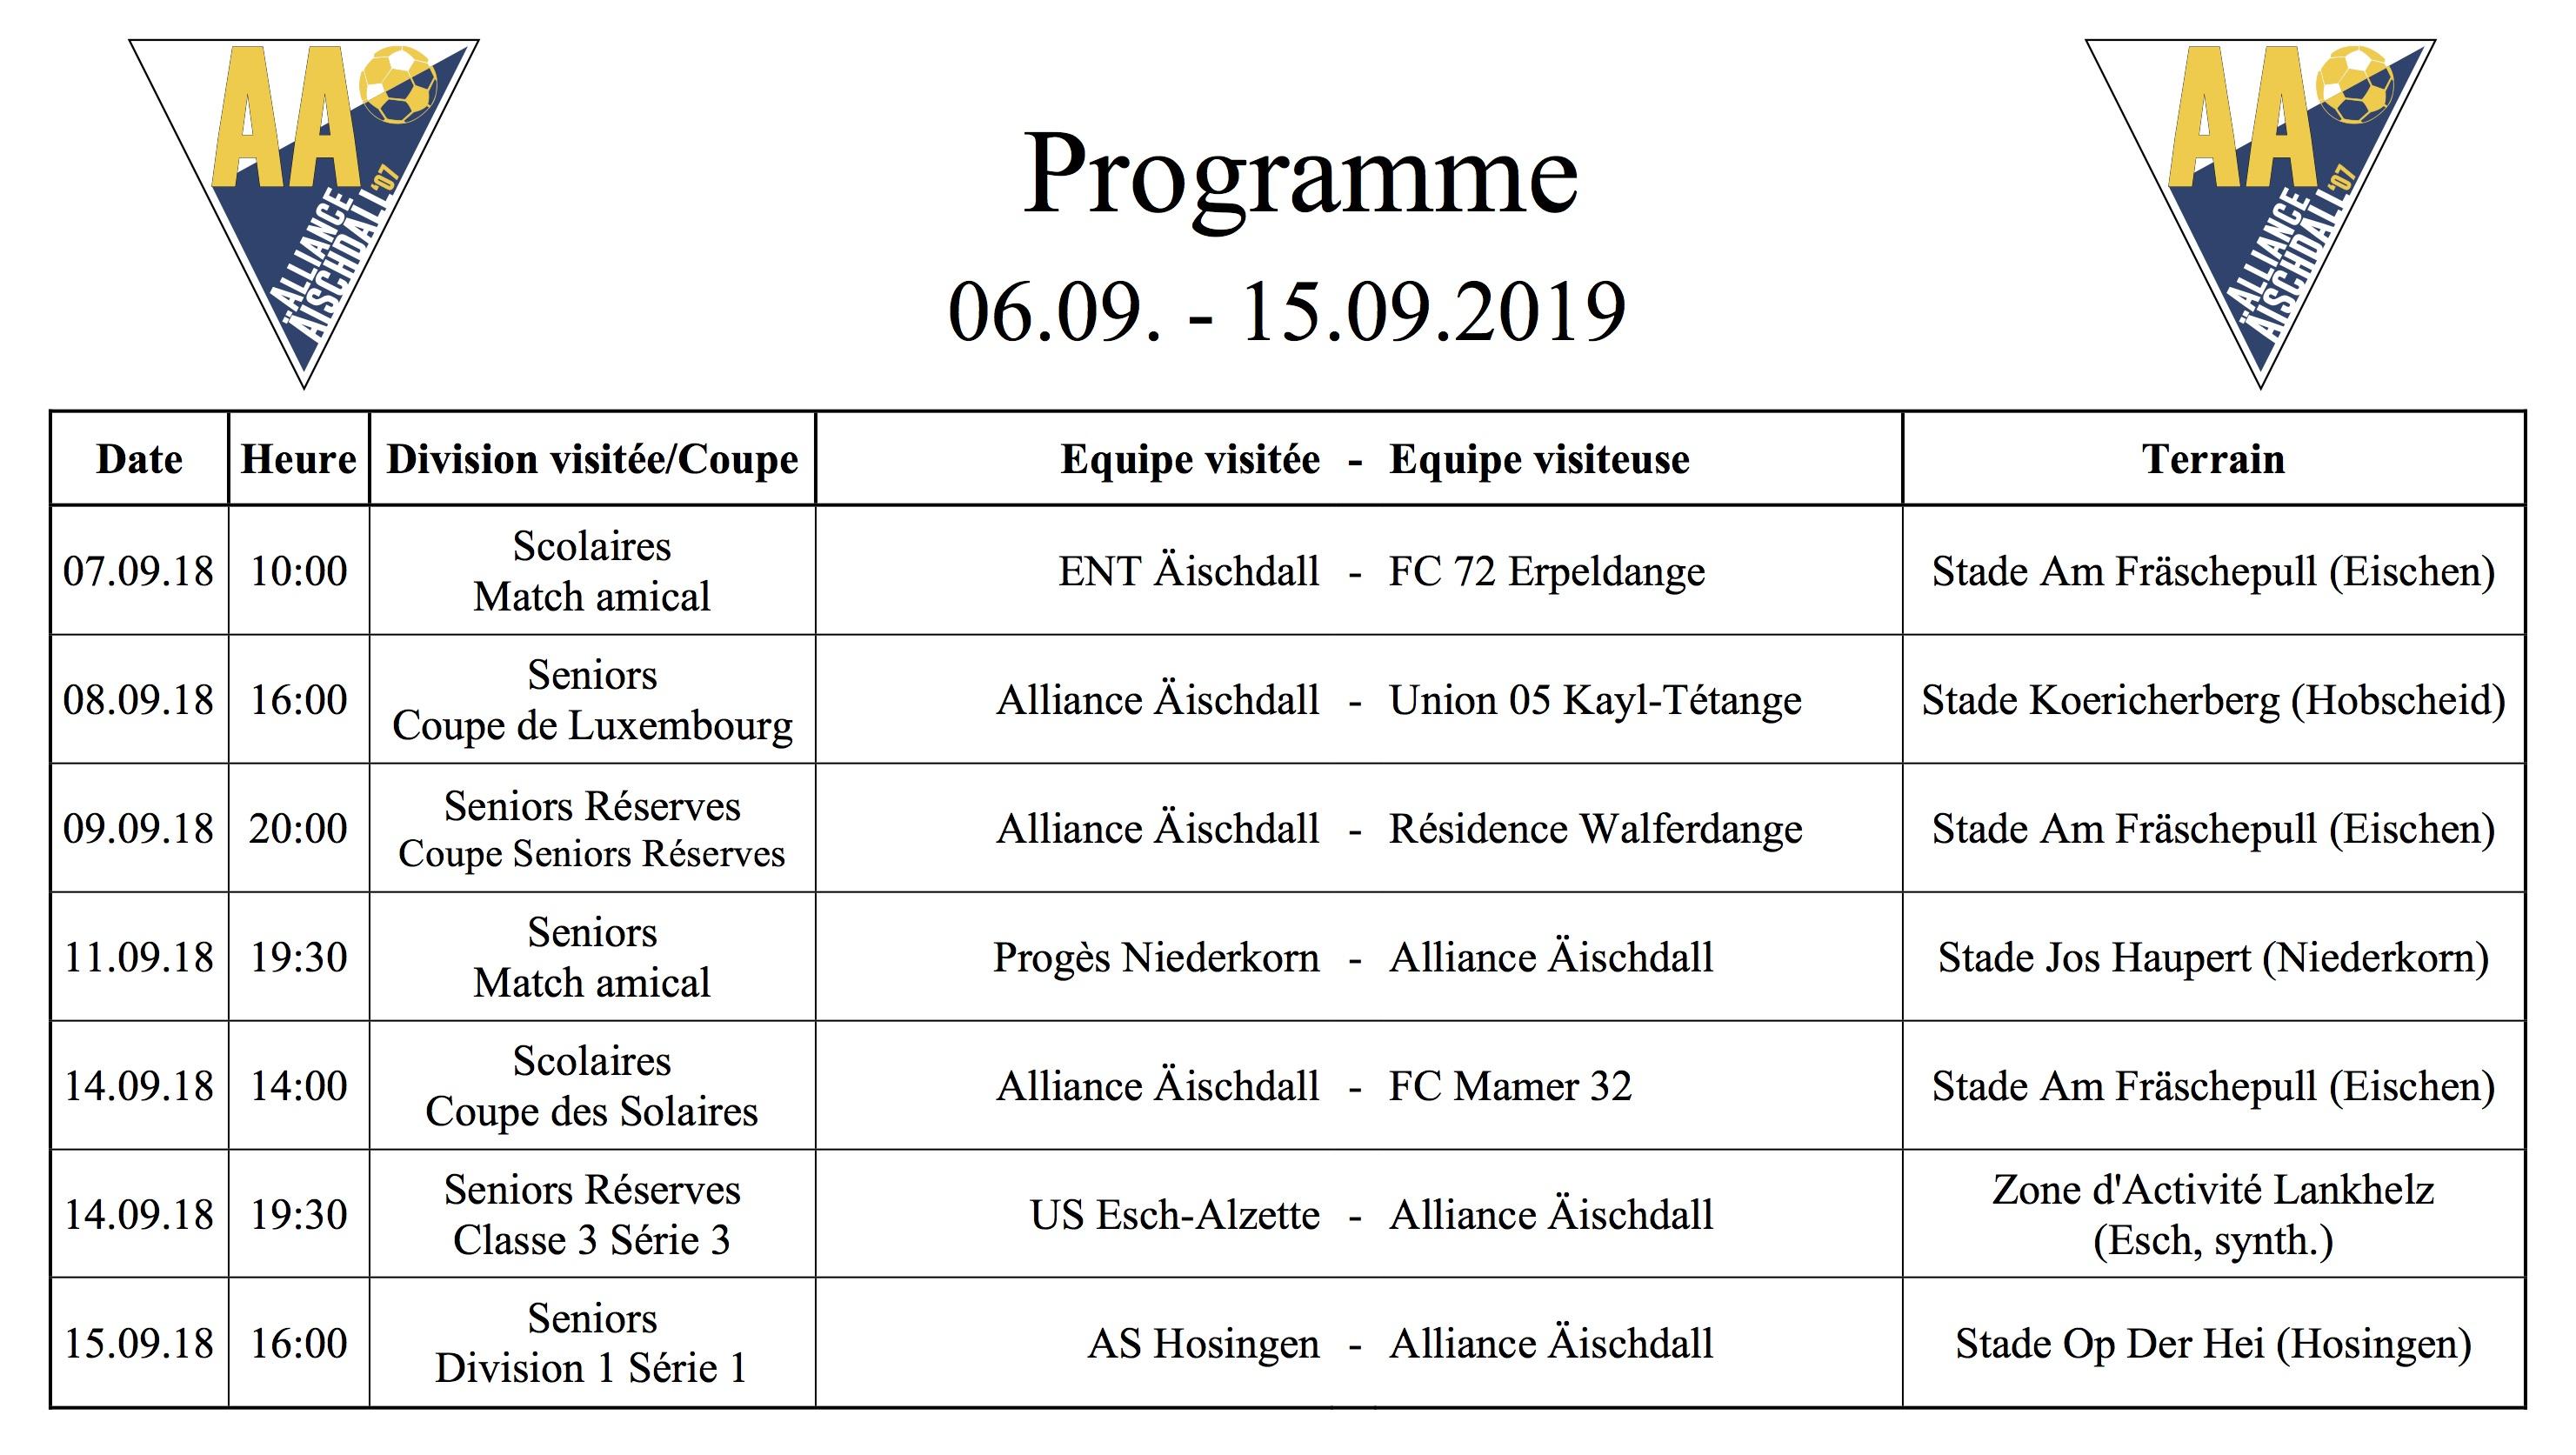 Programm 06.09.-15.09.2019